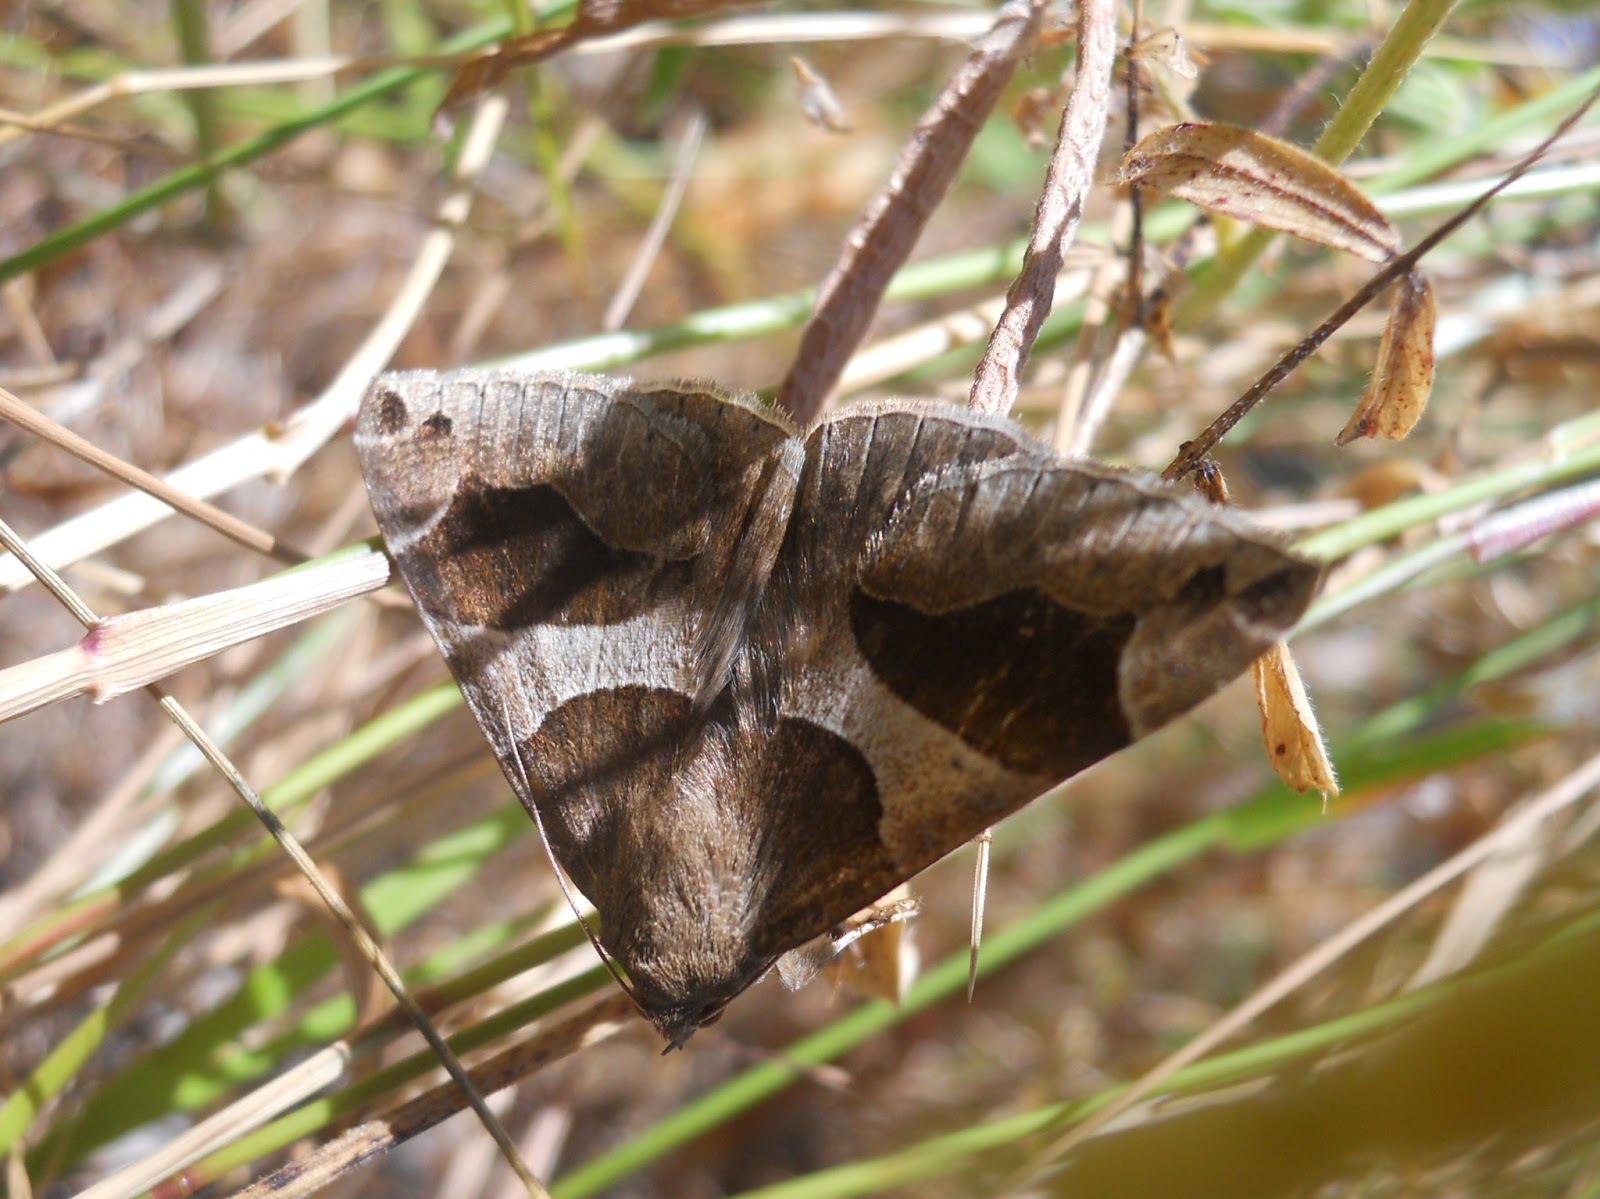 Disgonia algira, mariposa nocturna de coloración discreta